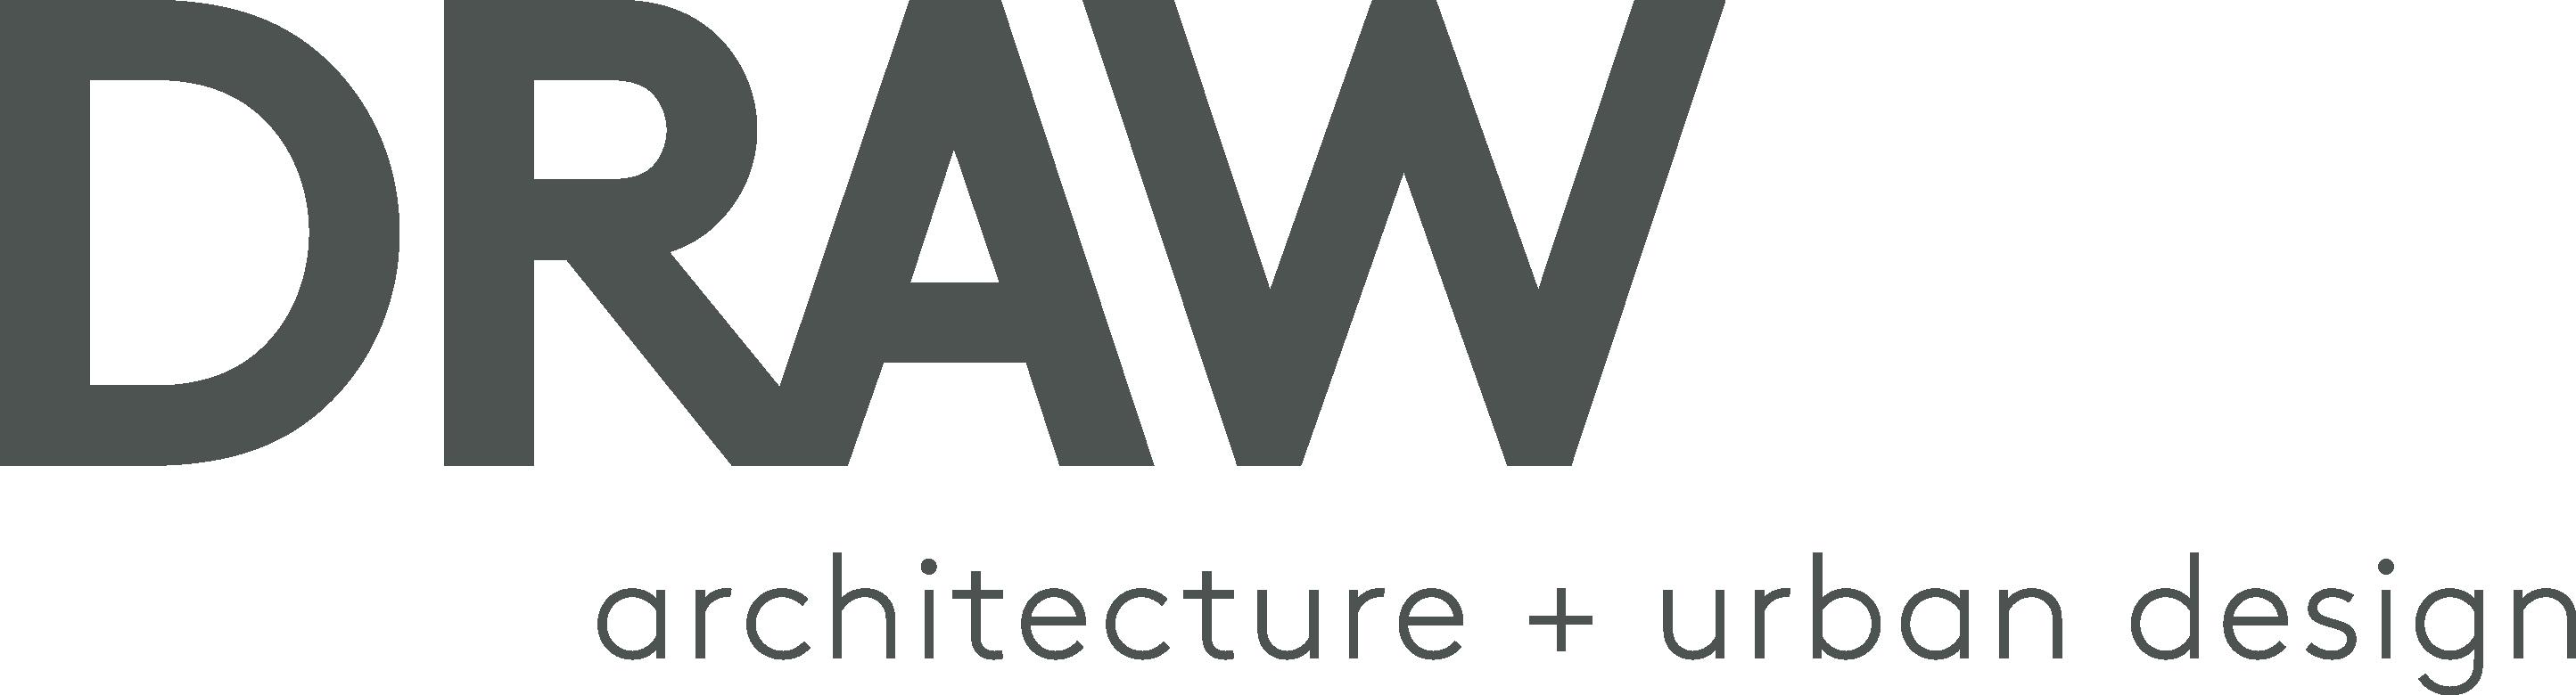 DRAW-Logo-arch-urban-design-gray_LIGHTER